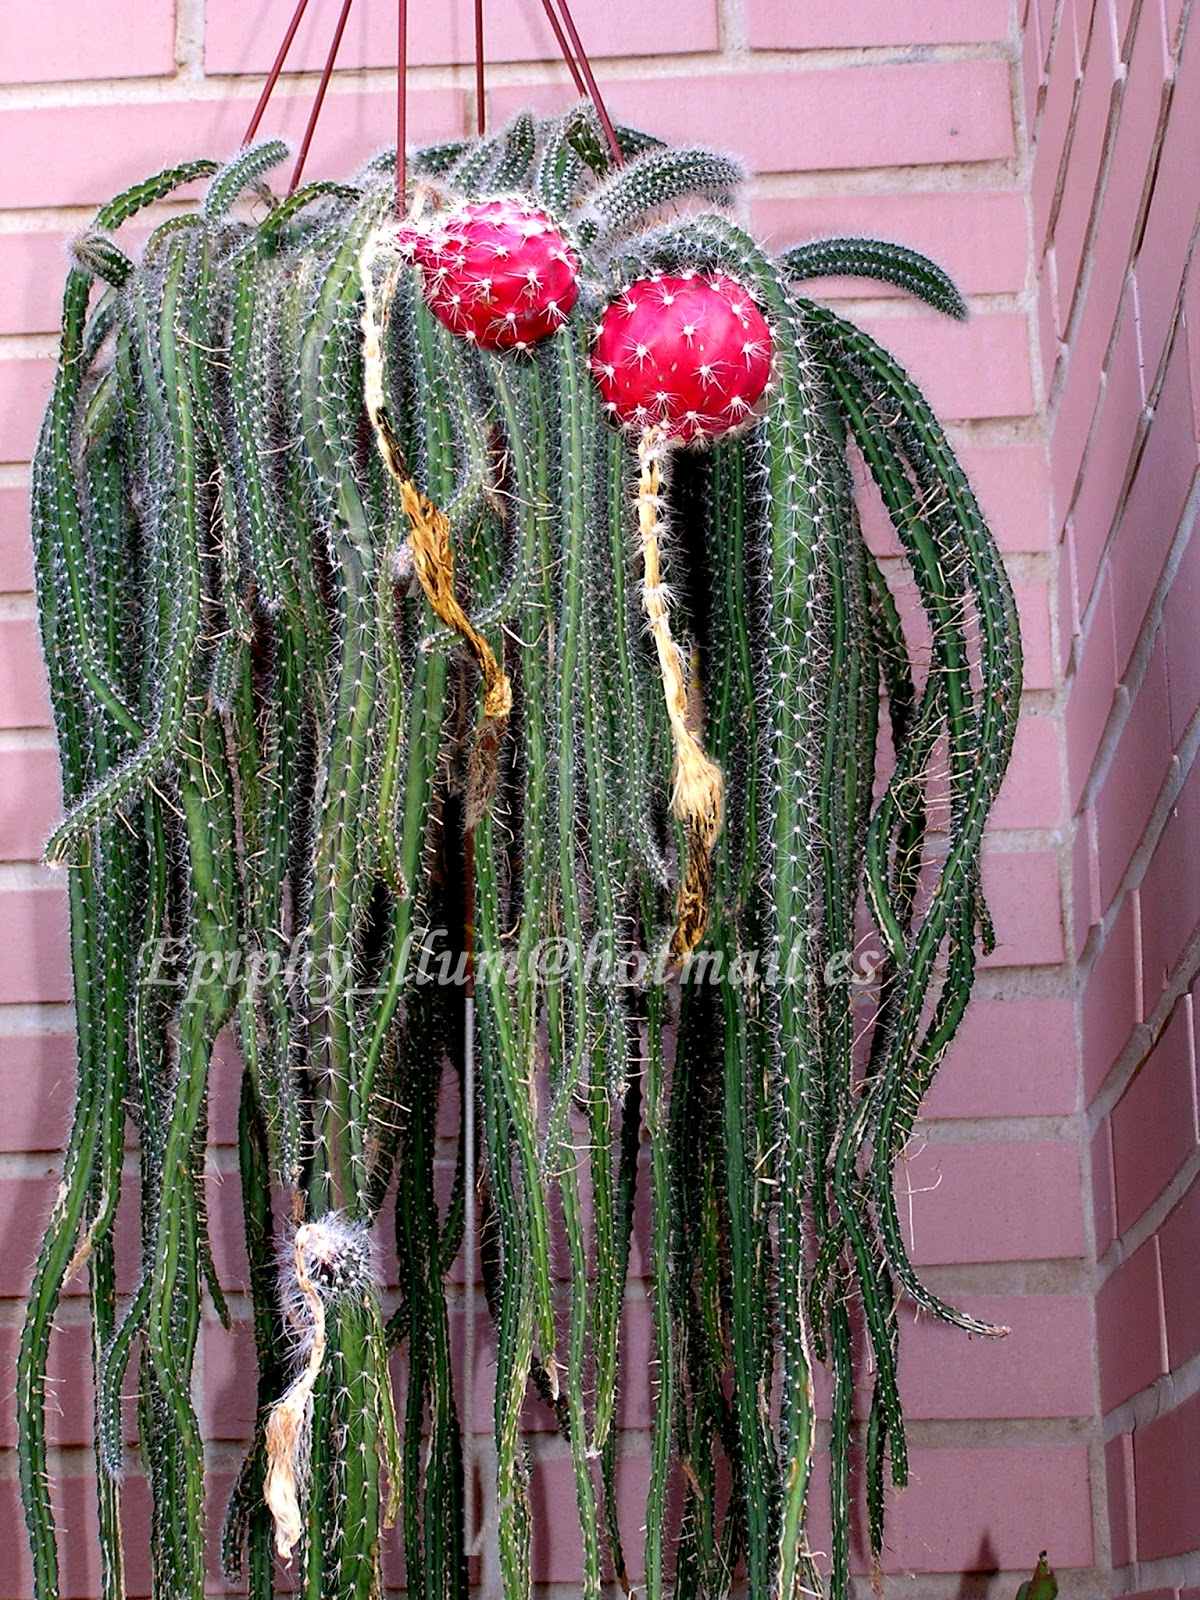 Plantas perennes exterior dise os arquitect nicos - Plantas perennes exterior ...